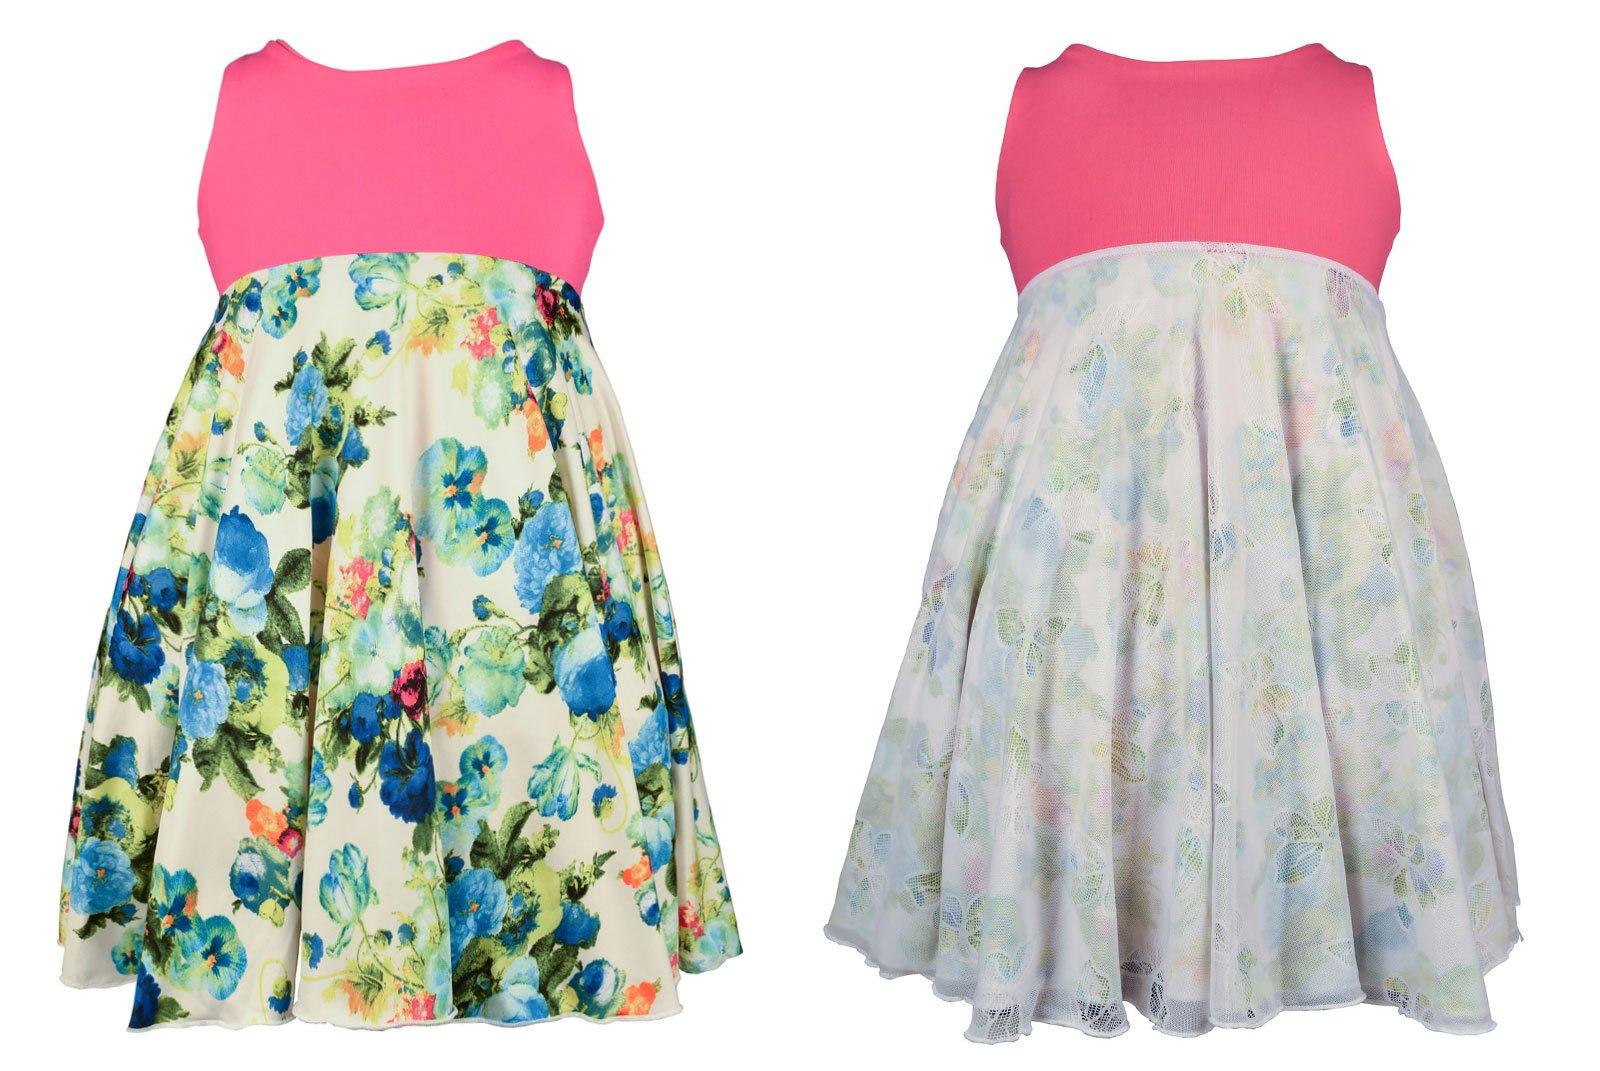 Spinning Tales Butterfly Garden Spin Dress - Reversible (10)